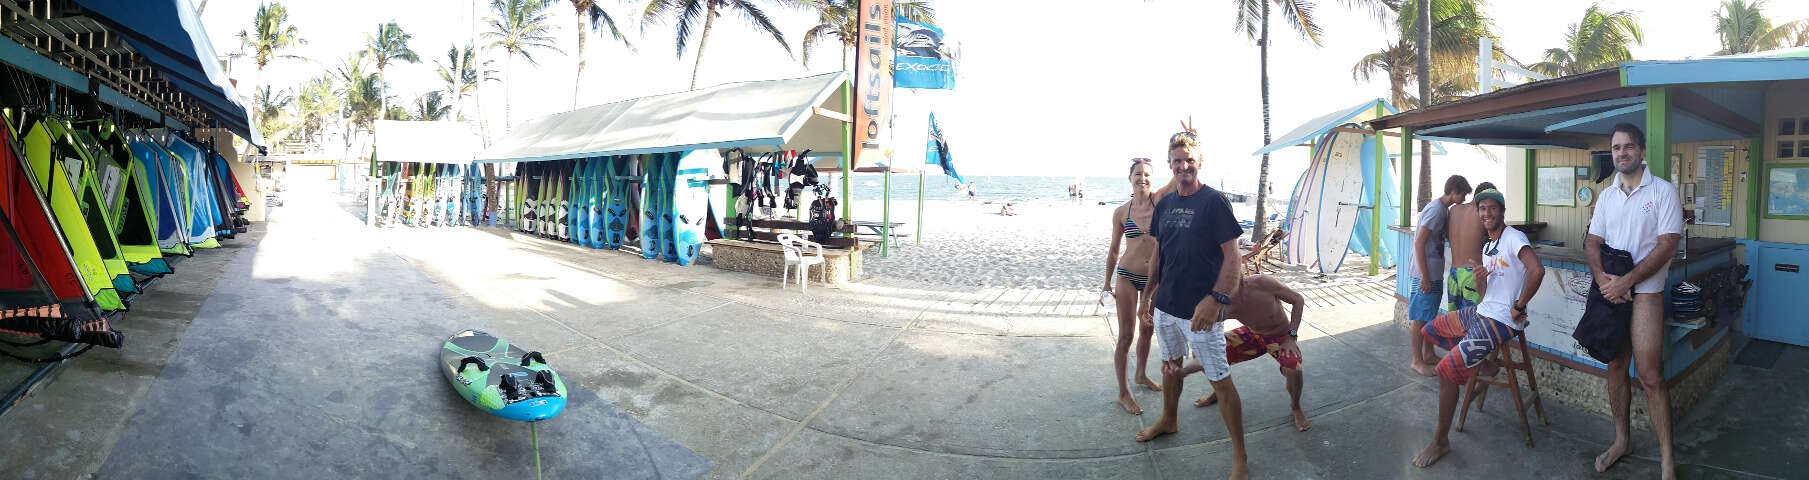 Club Nathalie Simon Margarita, El Yaque Beach, Isla Margarita